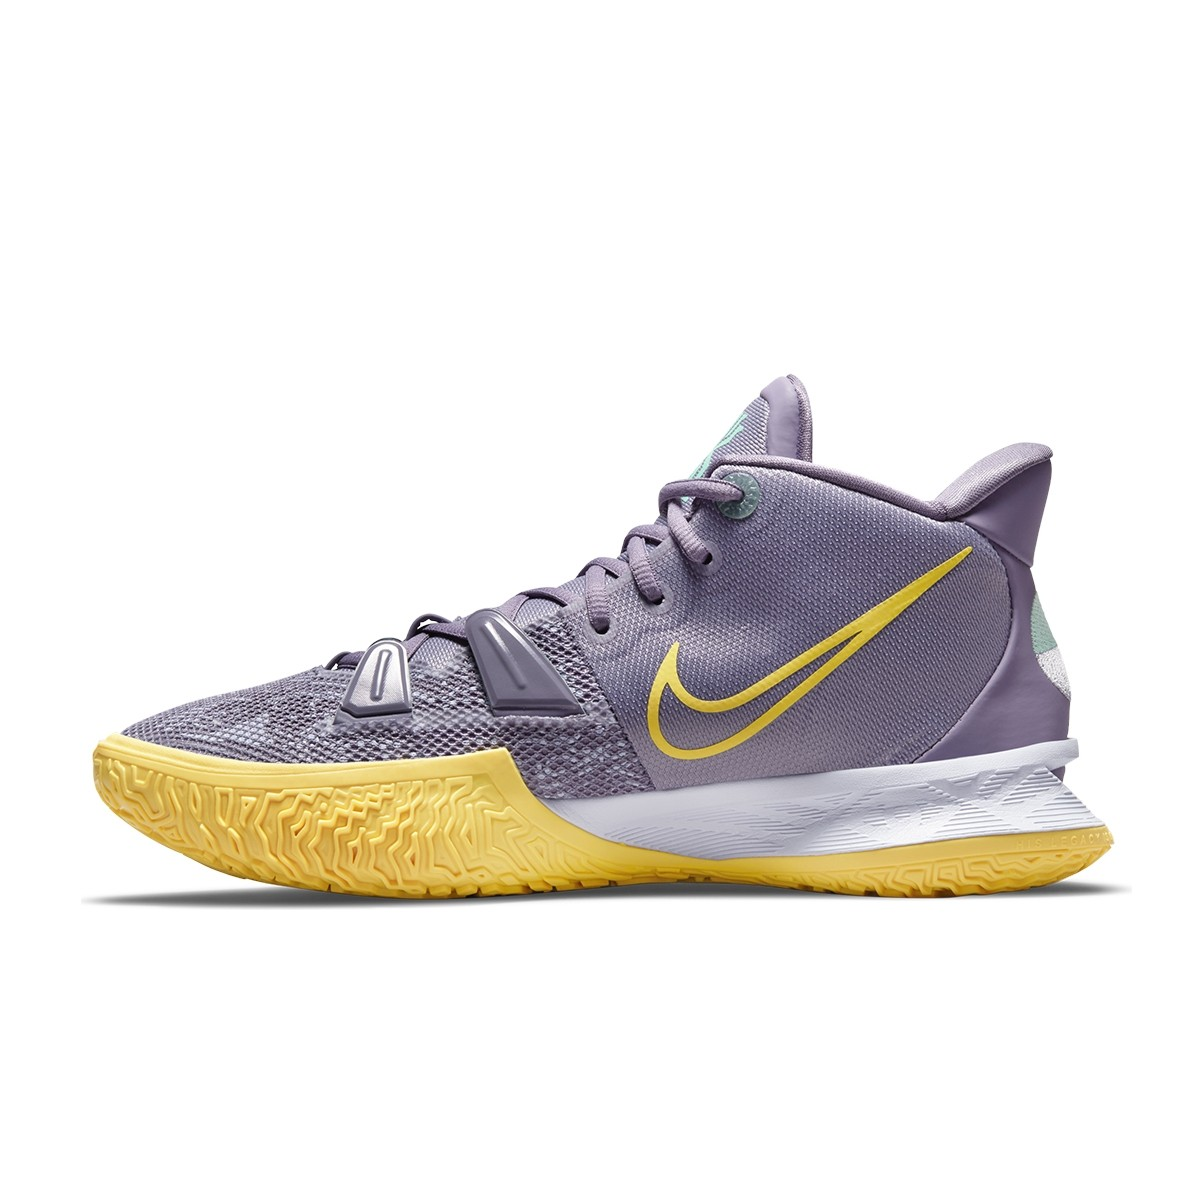 Nike Kyrie 7 'Daybreak'-CQ9326-500